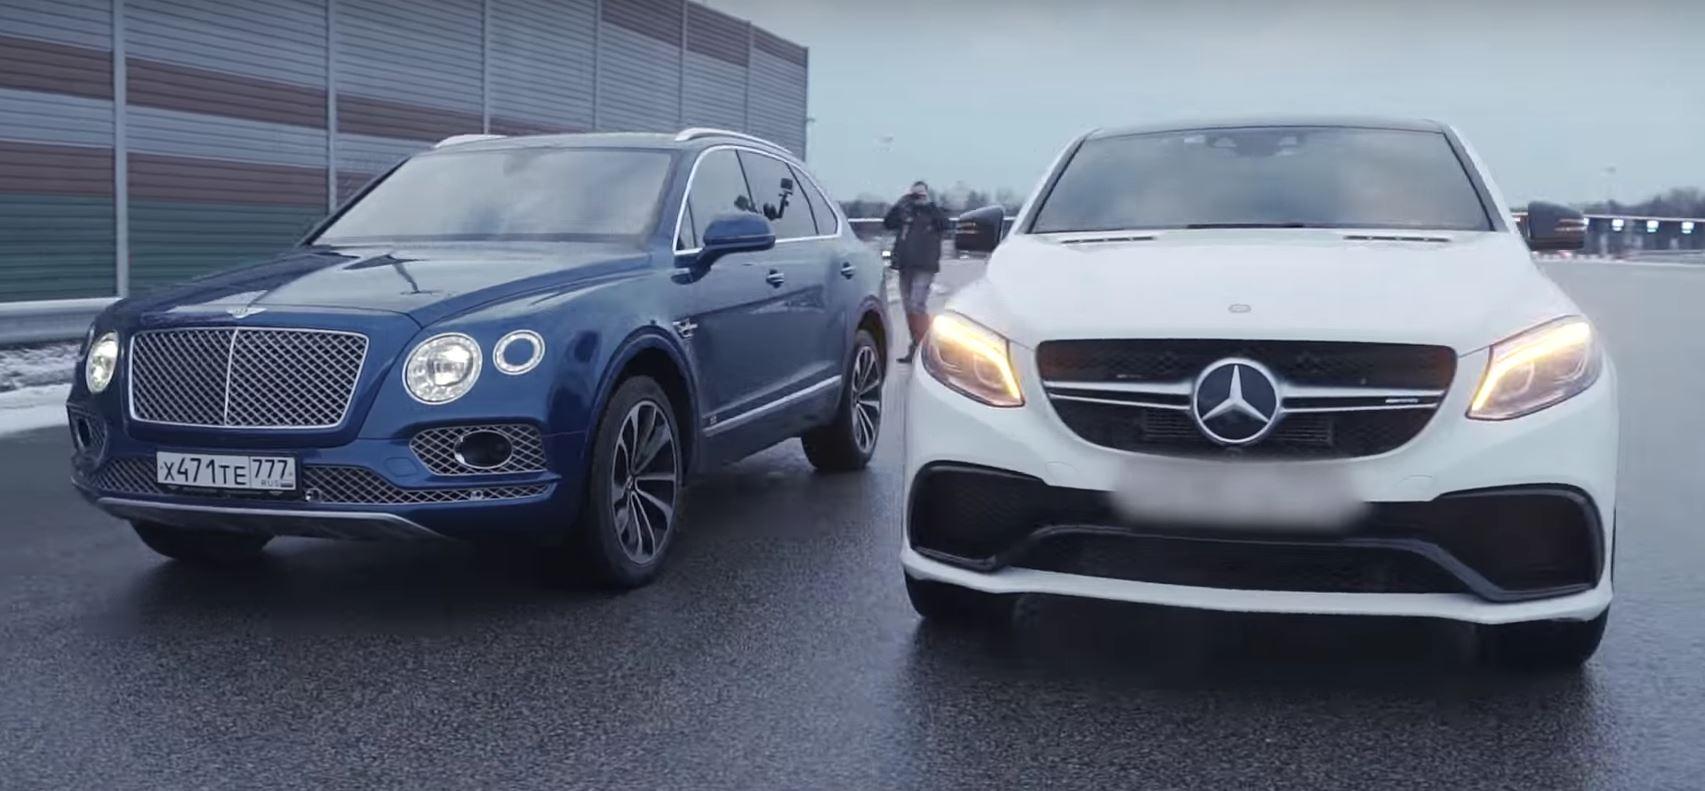 Bentley Bentayga Vs Mercedes Amg Gle 63 Coupe Comparison Includes Drag Race Autoevolution